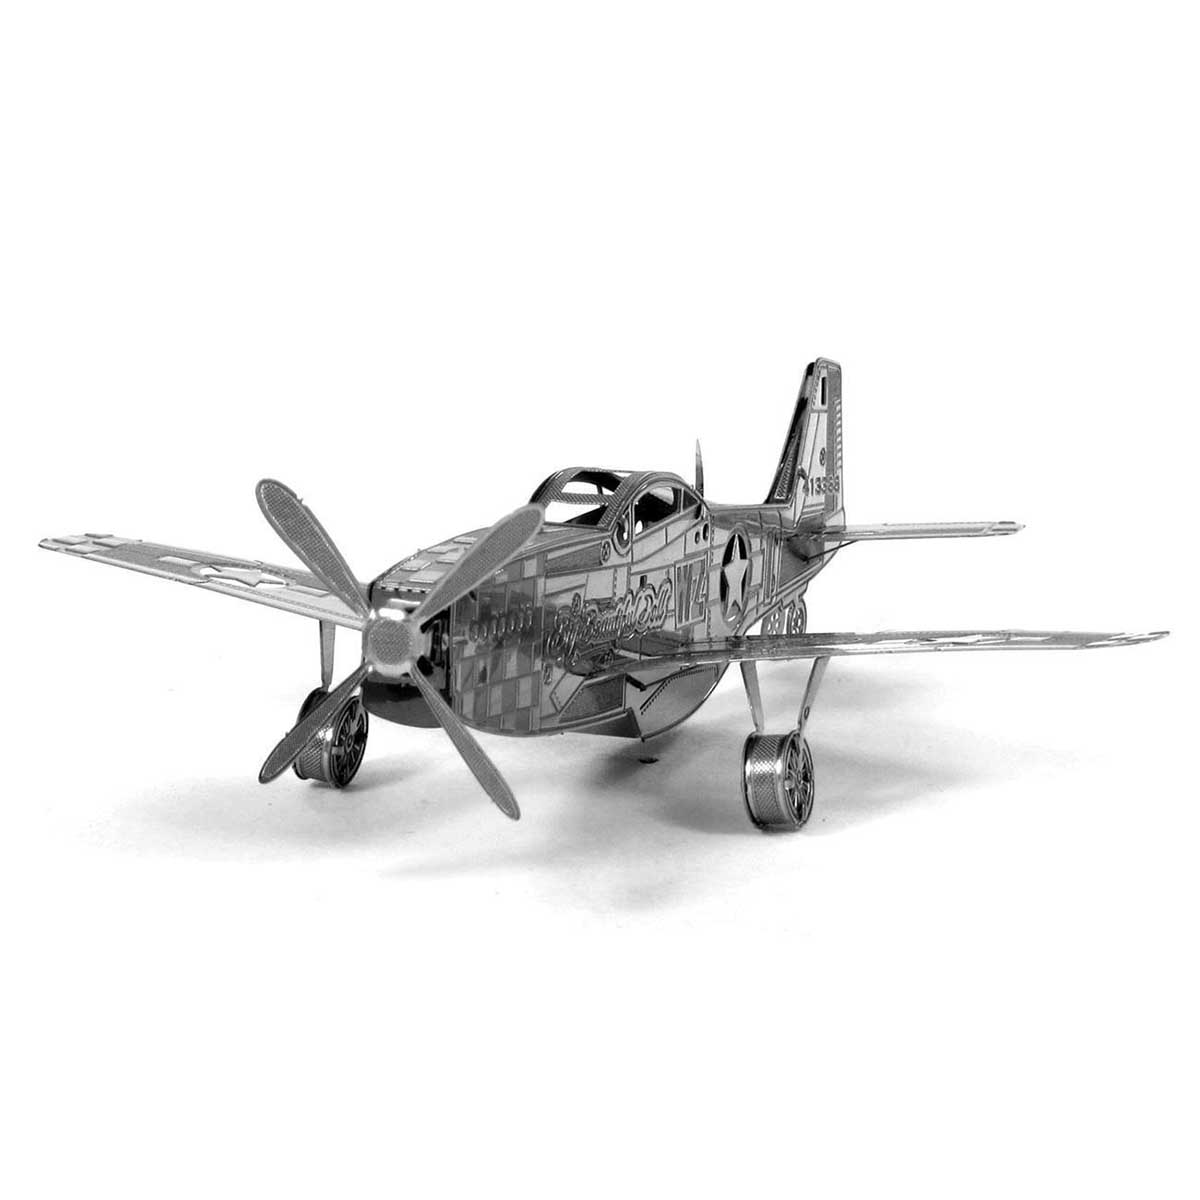 Mustang P-51 Boeing plane Planes 3D Puzzle